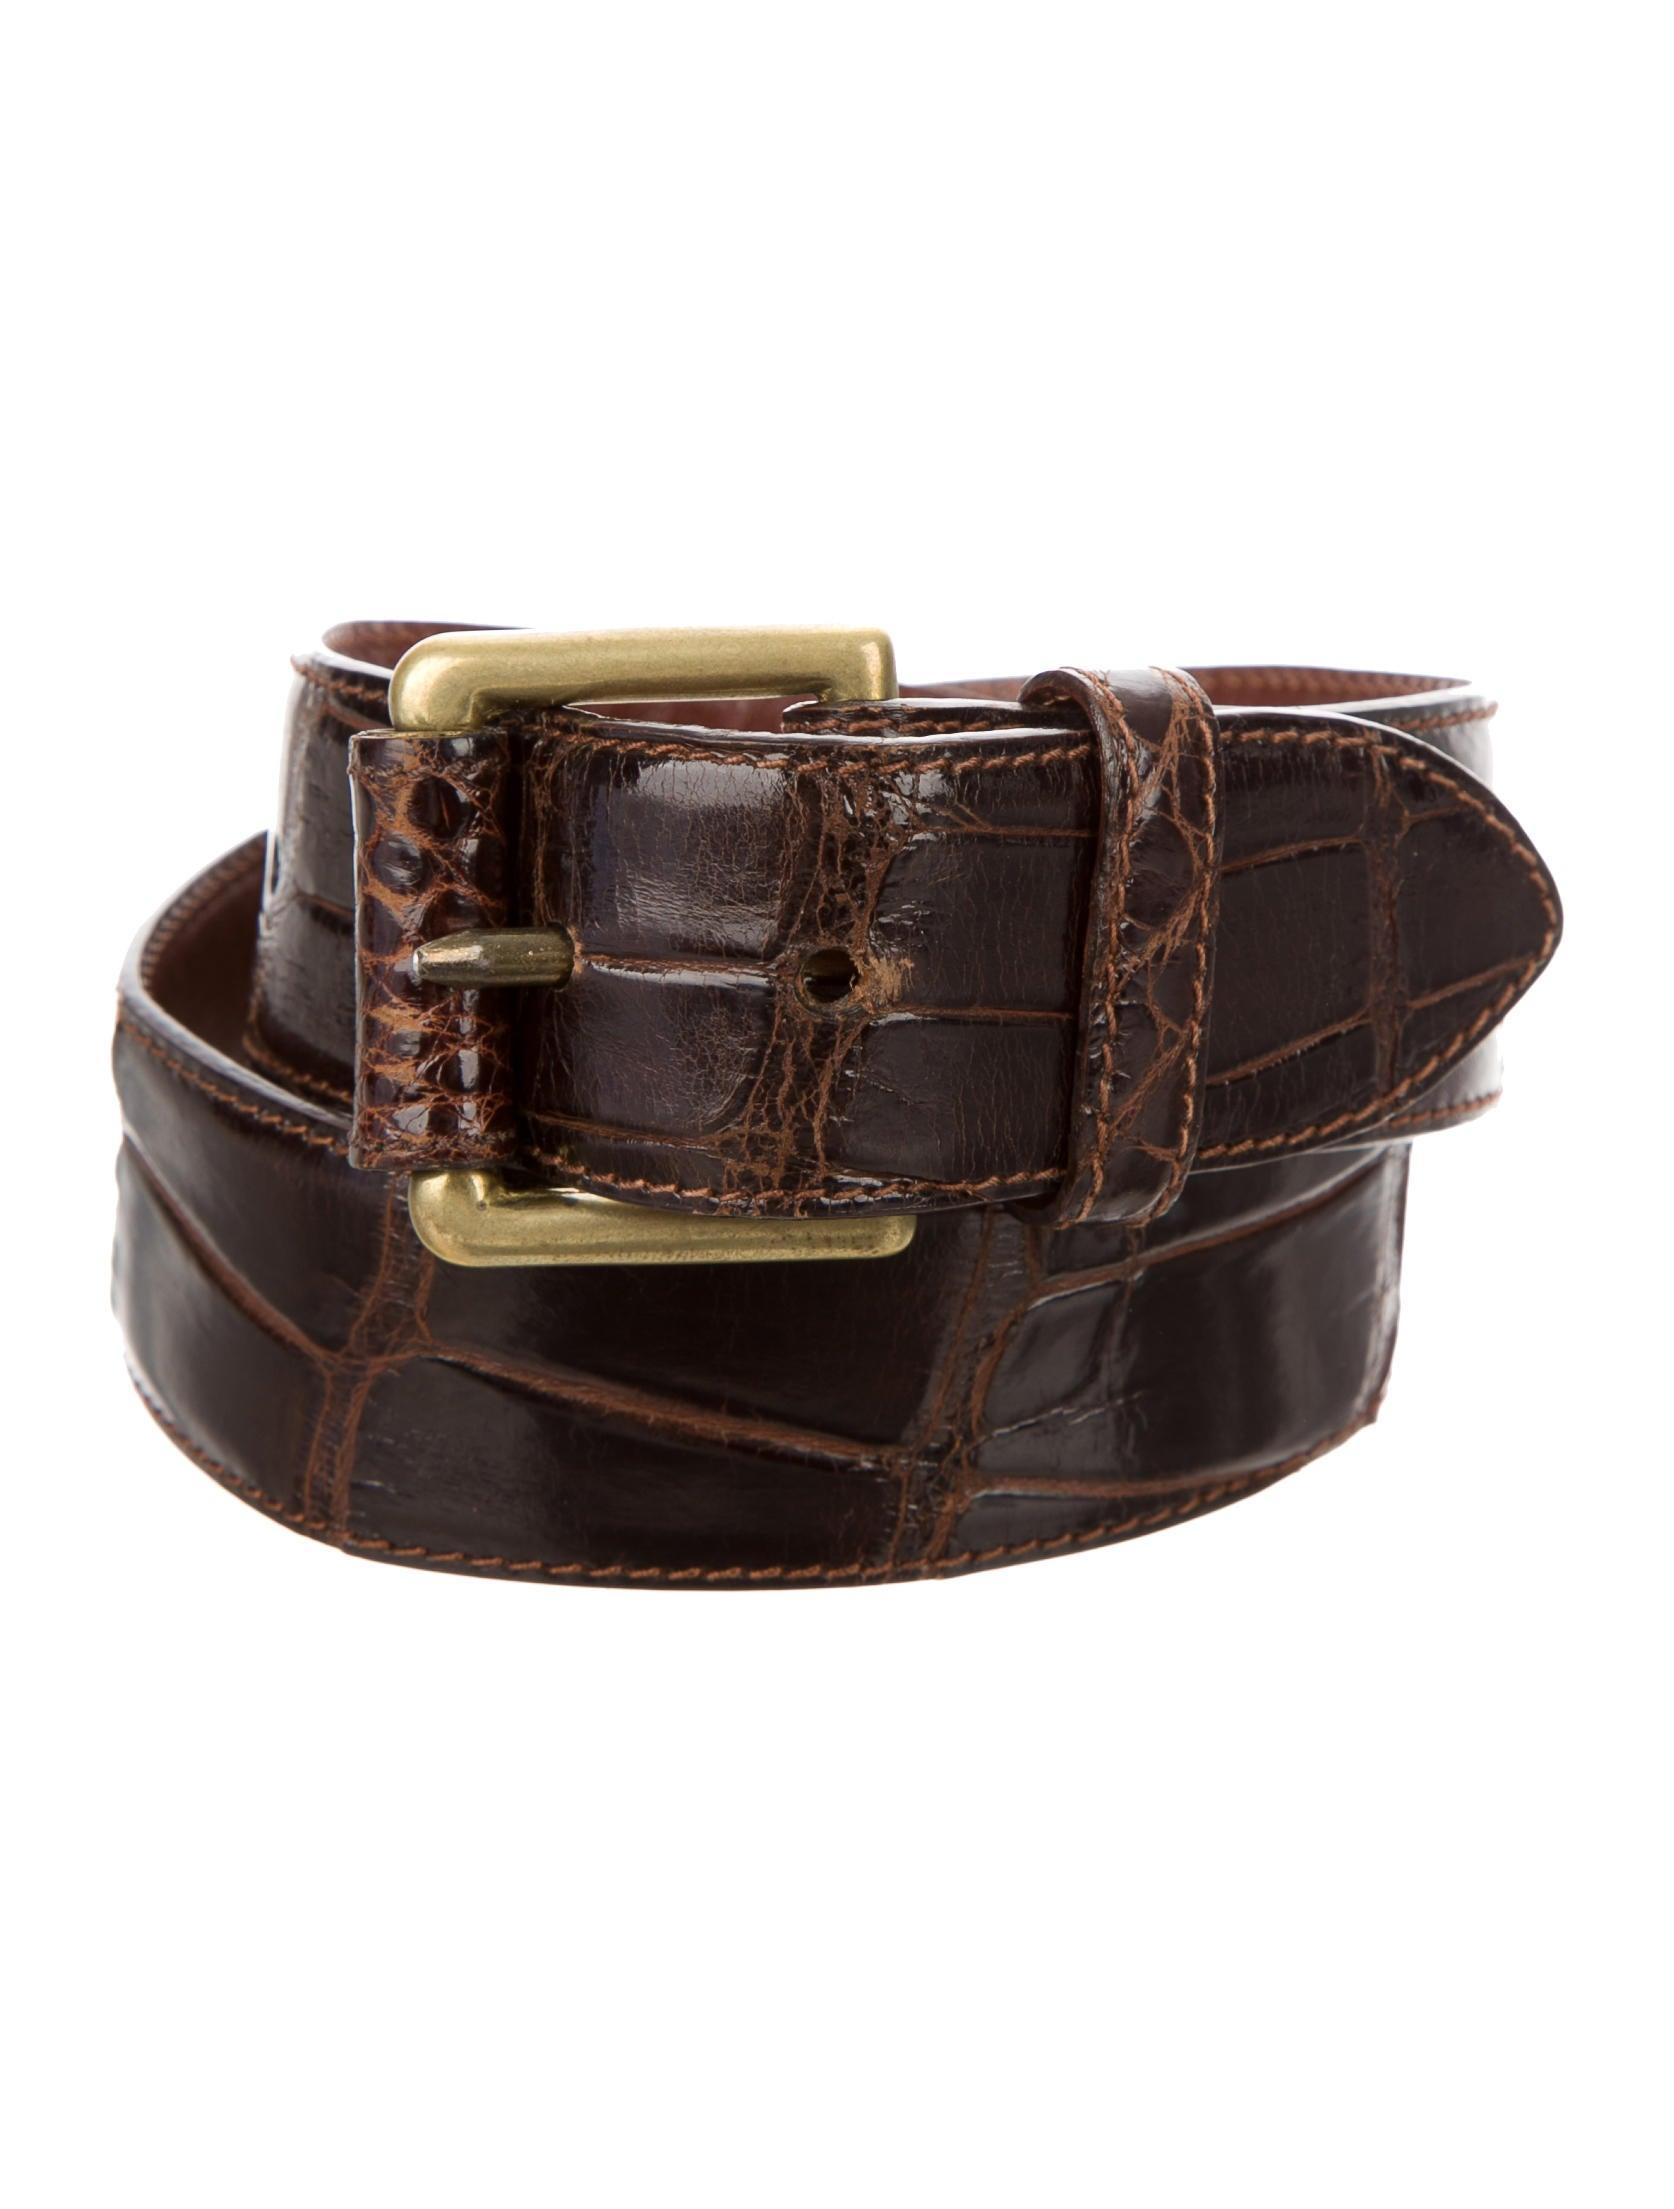 polo ralph lauren brown alligator belt accessories. Black Bedroom Furniture Sets. Home Design Ideas